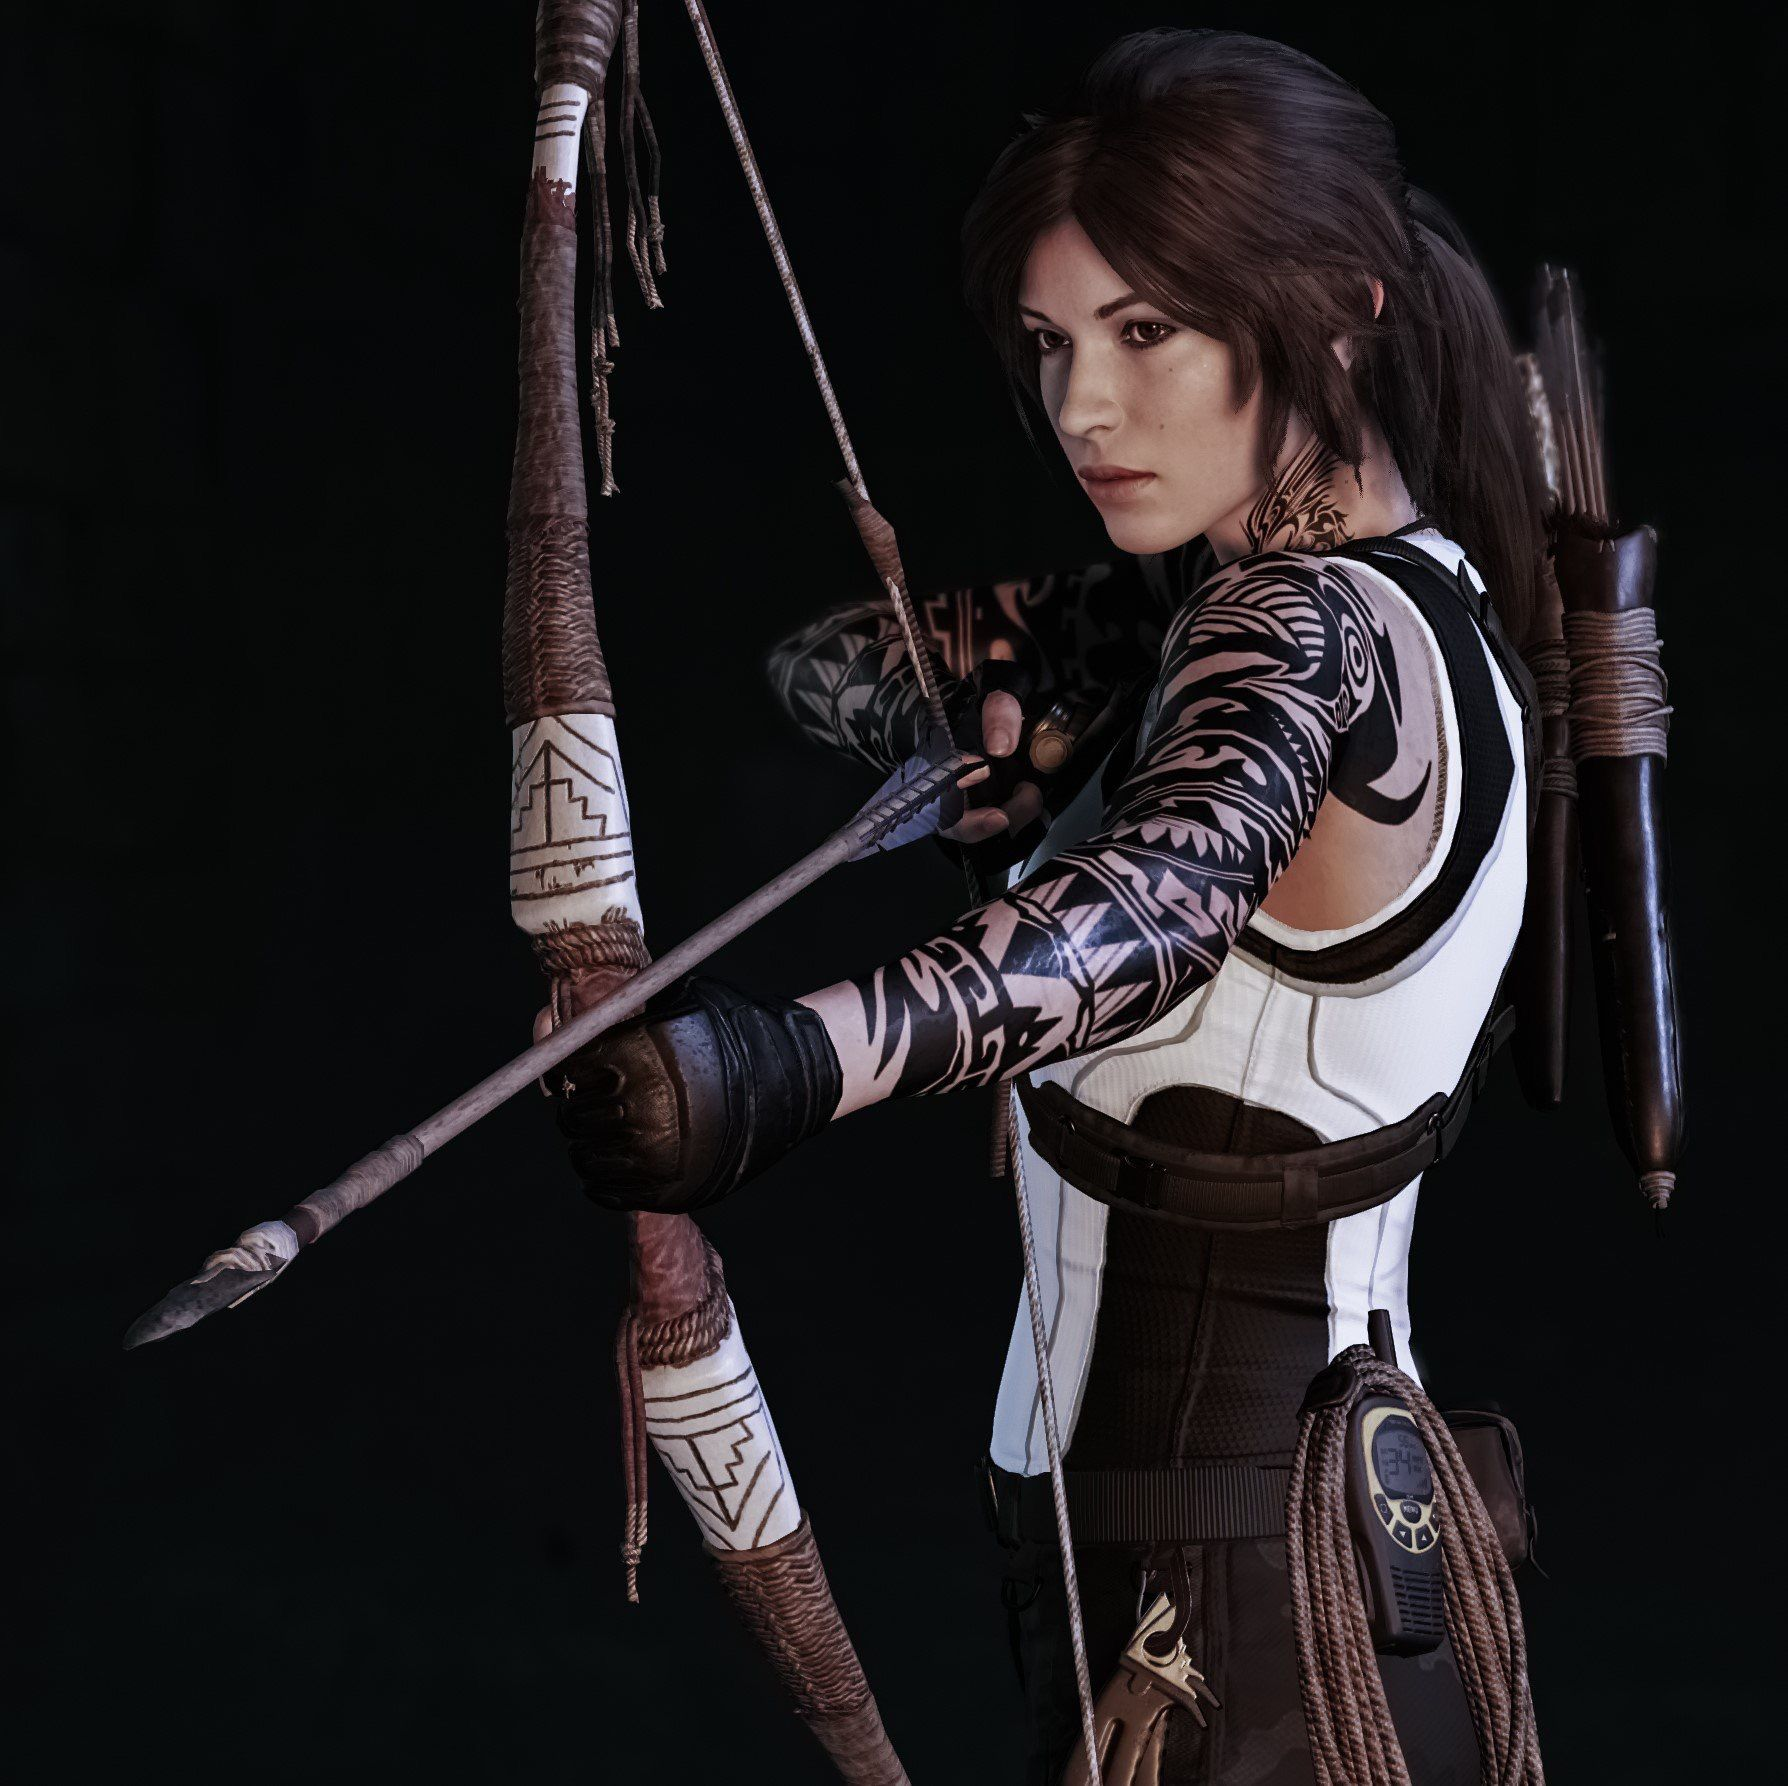 Wallpaper Lara Croft Shadow Of The Tomb Raider Concept: Mommy Croft #tombraider #laracroft